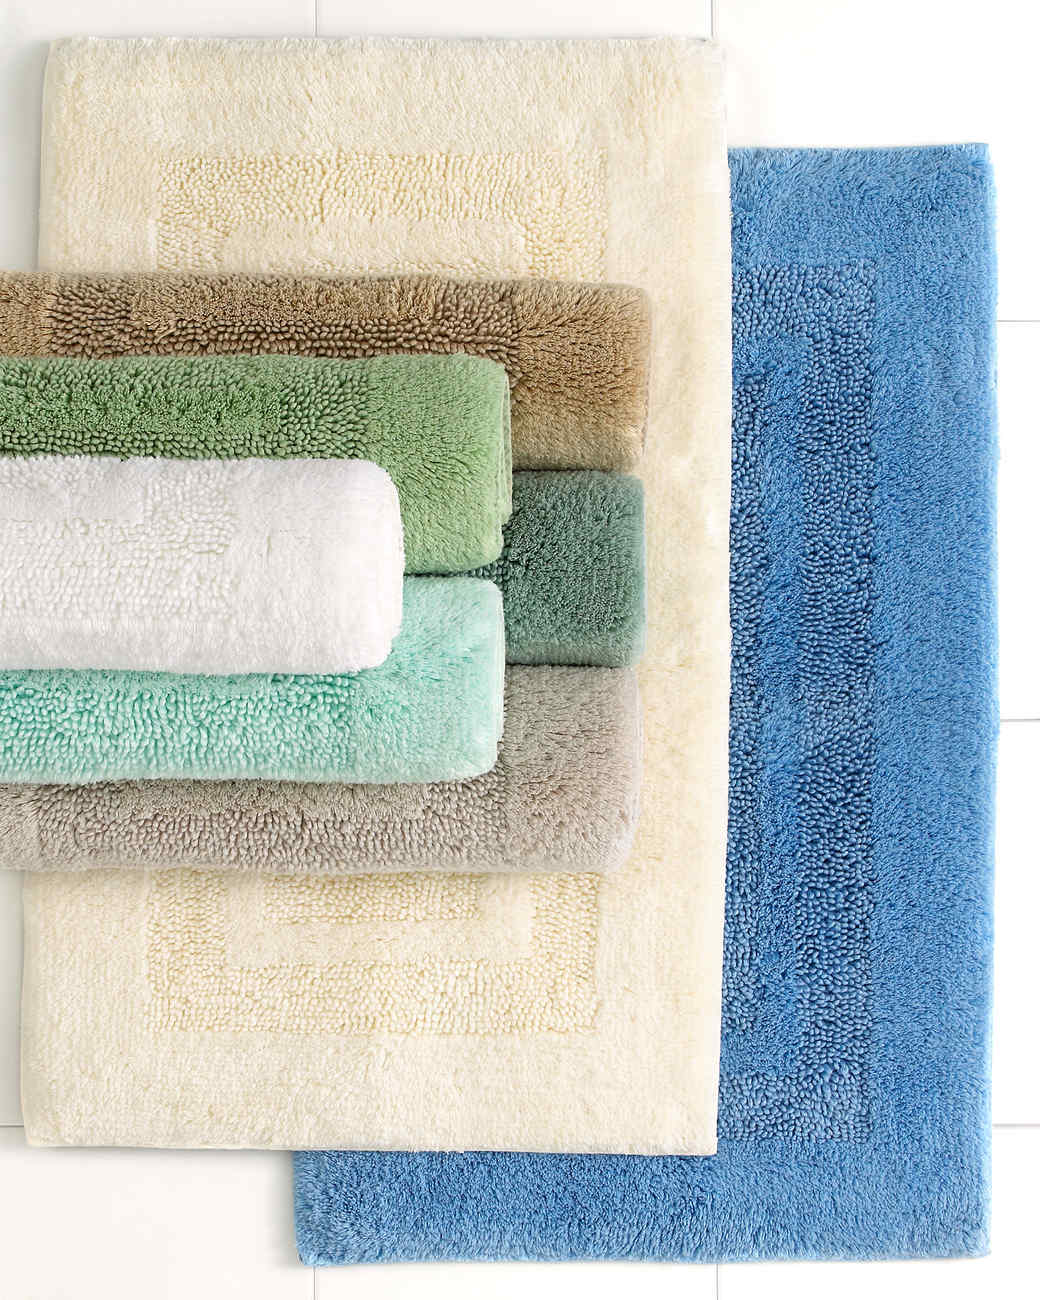 msmacys-checklist-bathroom-plushrugs-0515.jpg